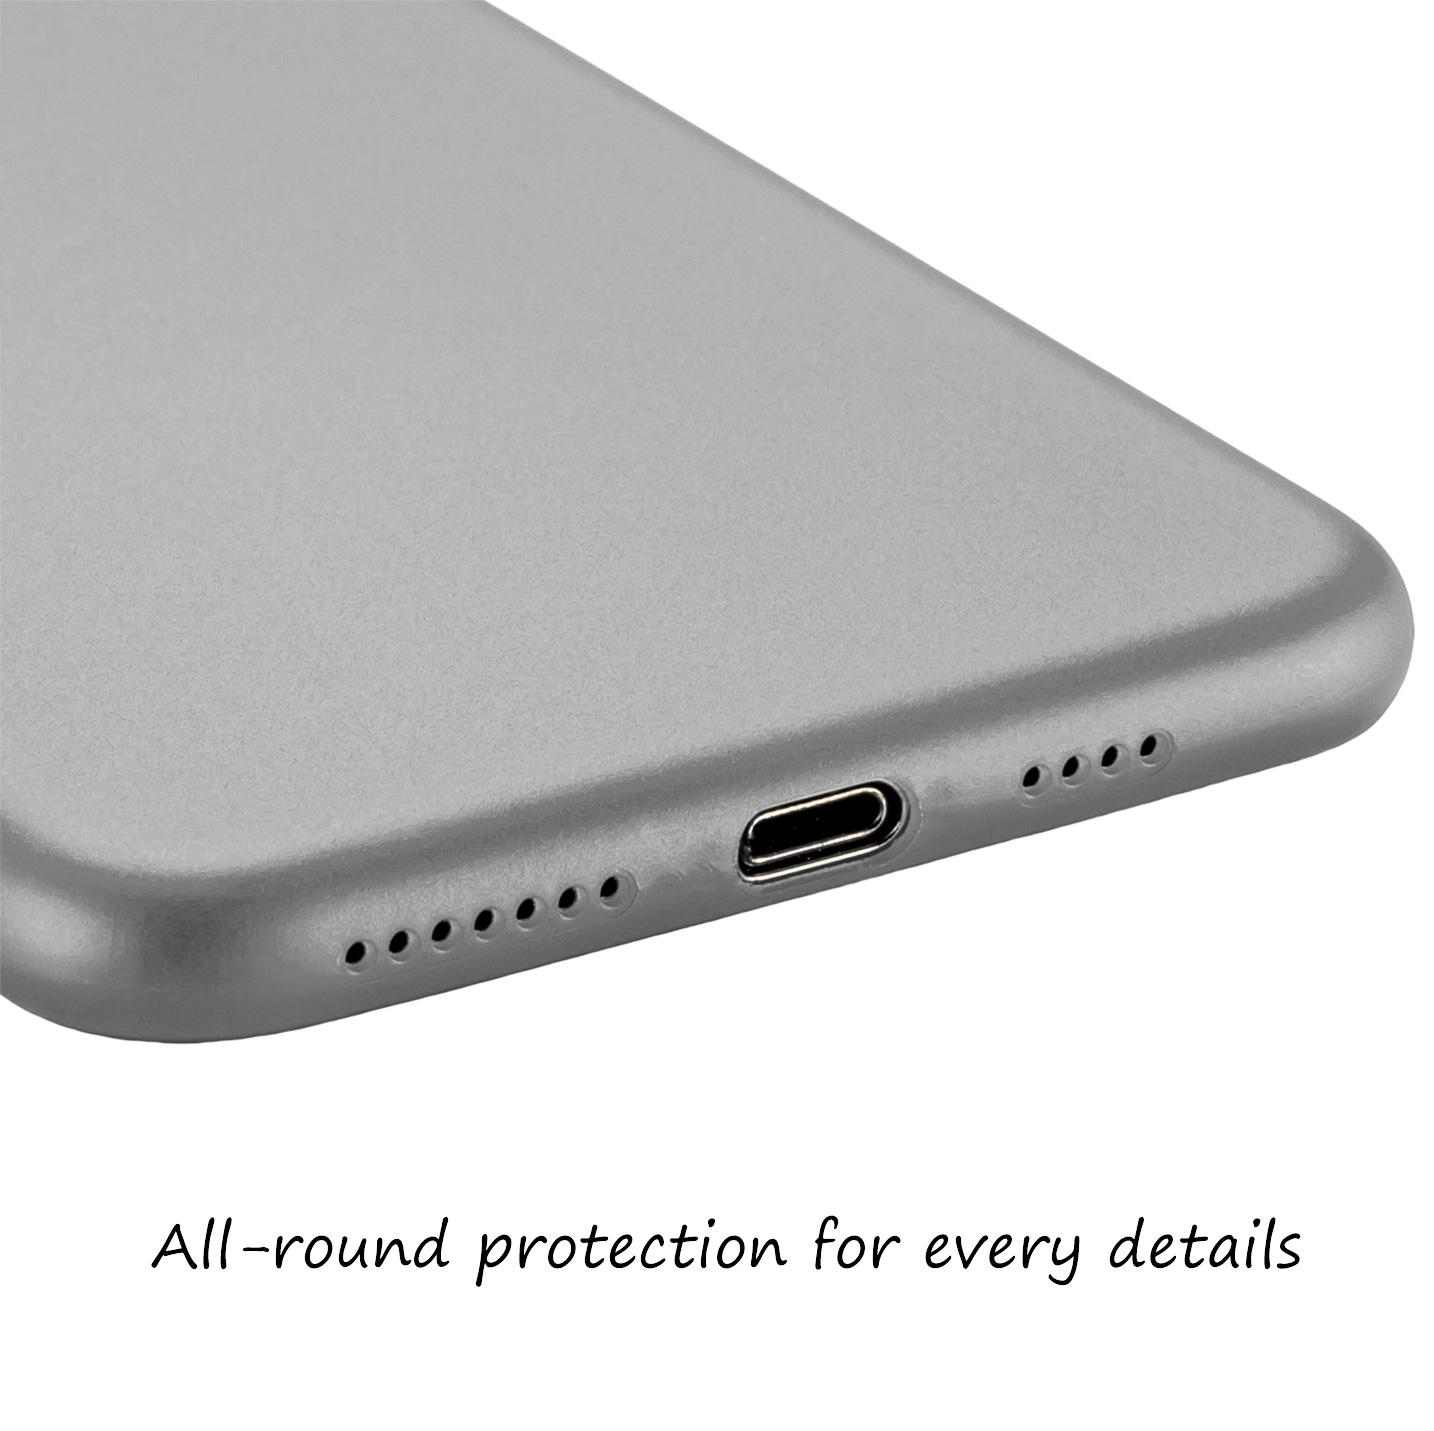 Ultra-Slim-Case-iPhone-11-Pro-5-8-034-Matt-Clear-Schutz-Huelle-Skin-Cover-Etui-Folie Indexbild 40